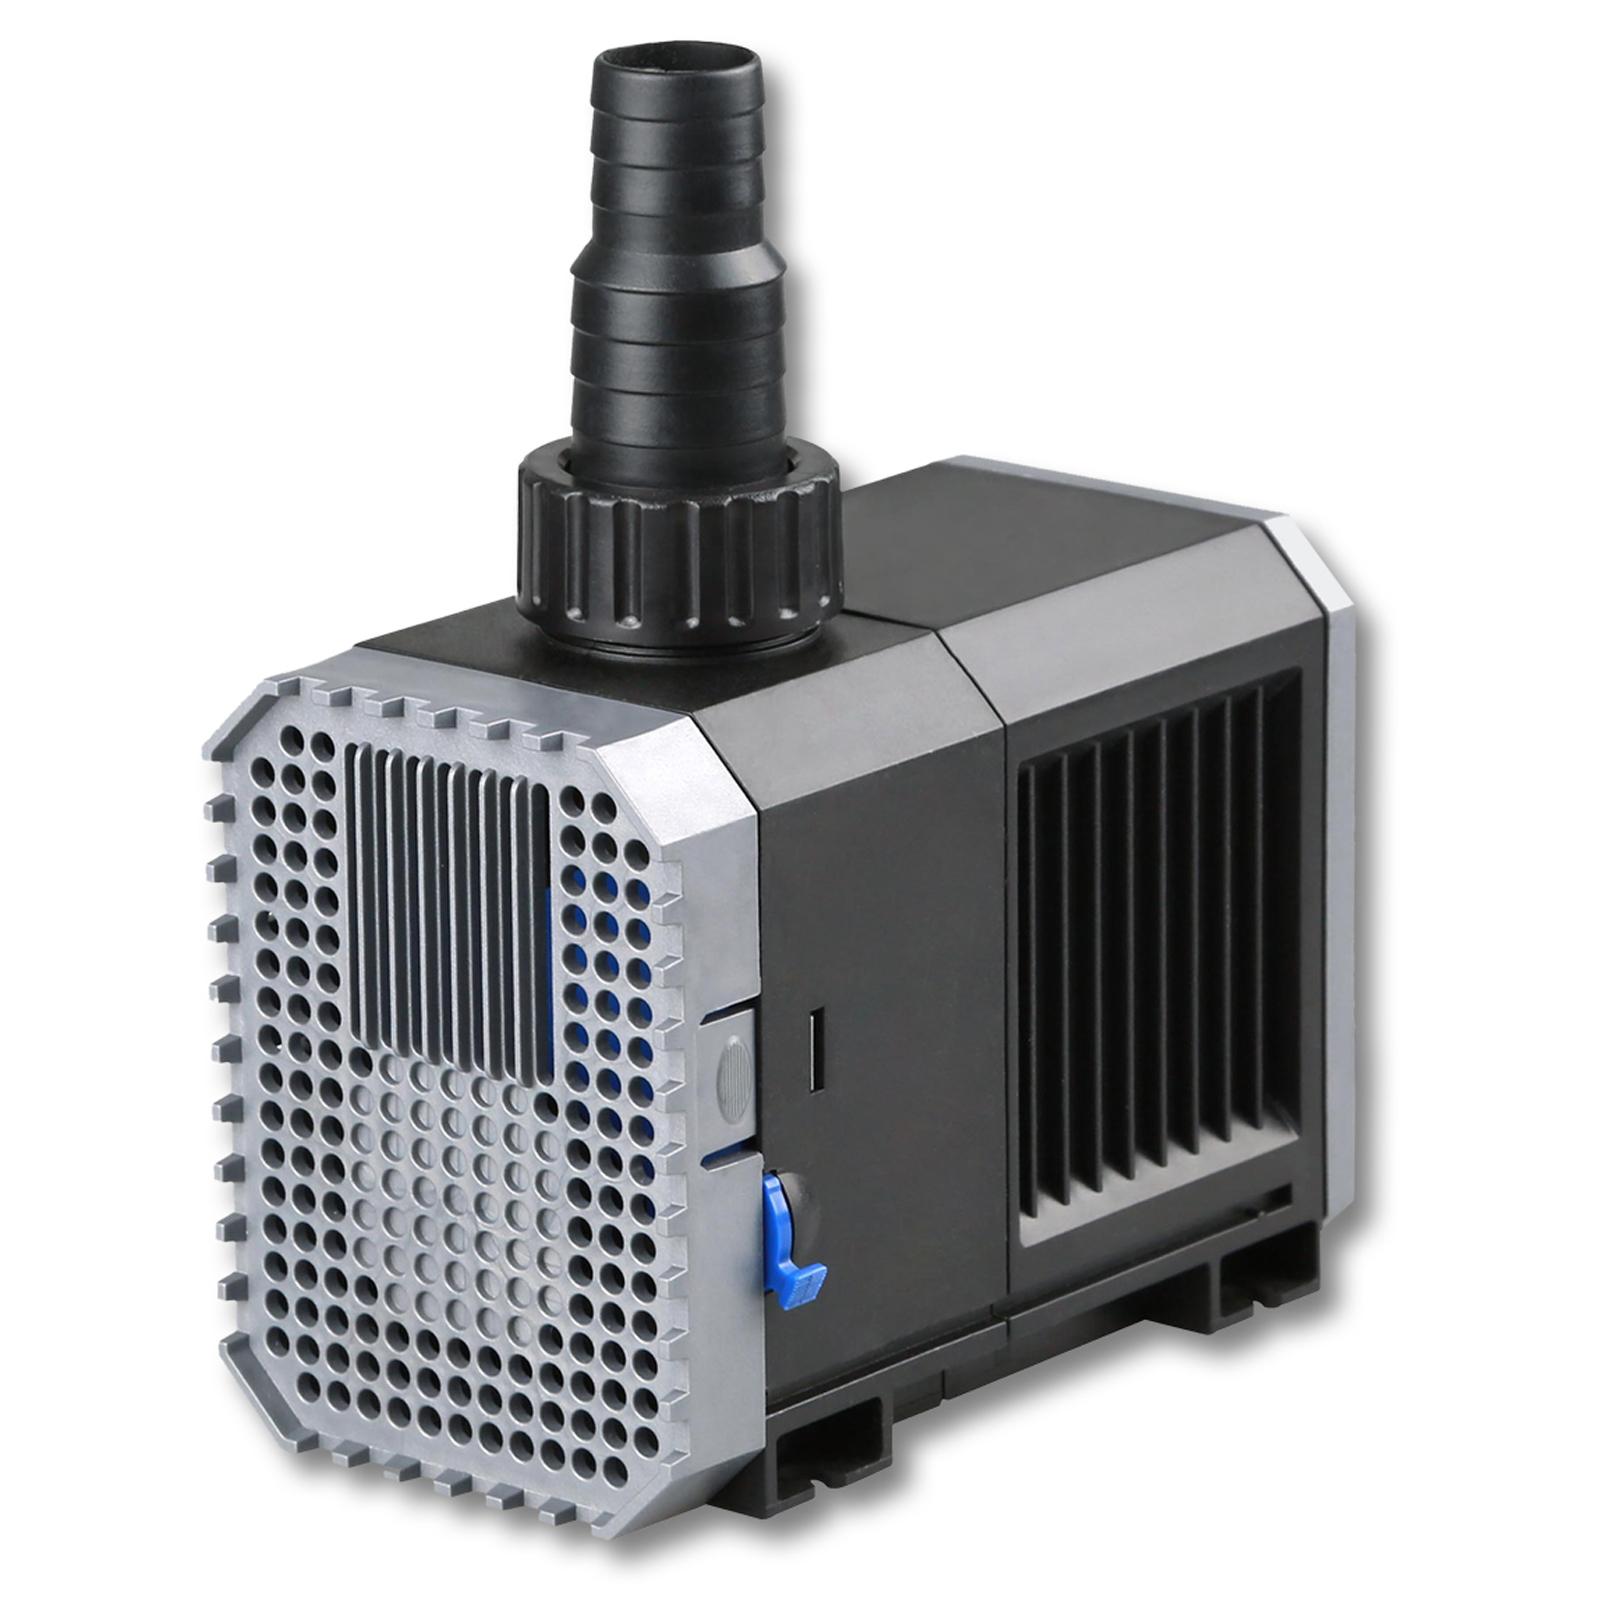 SunSun 3000l//h55W ECO Teichpumpe Bachlaufpumpe Filterpumpe TeichFilter CHJ3000